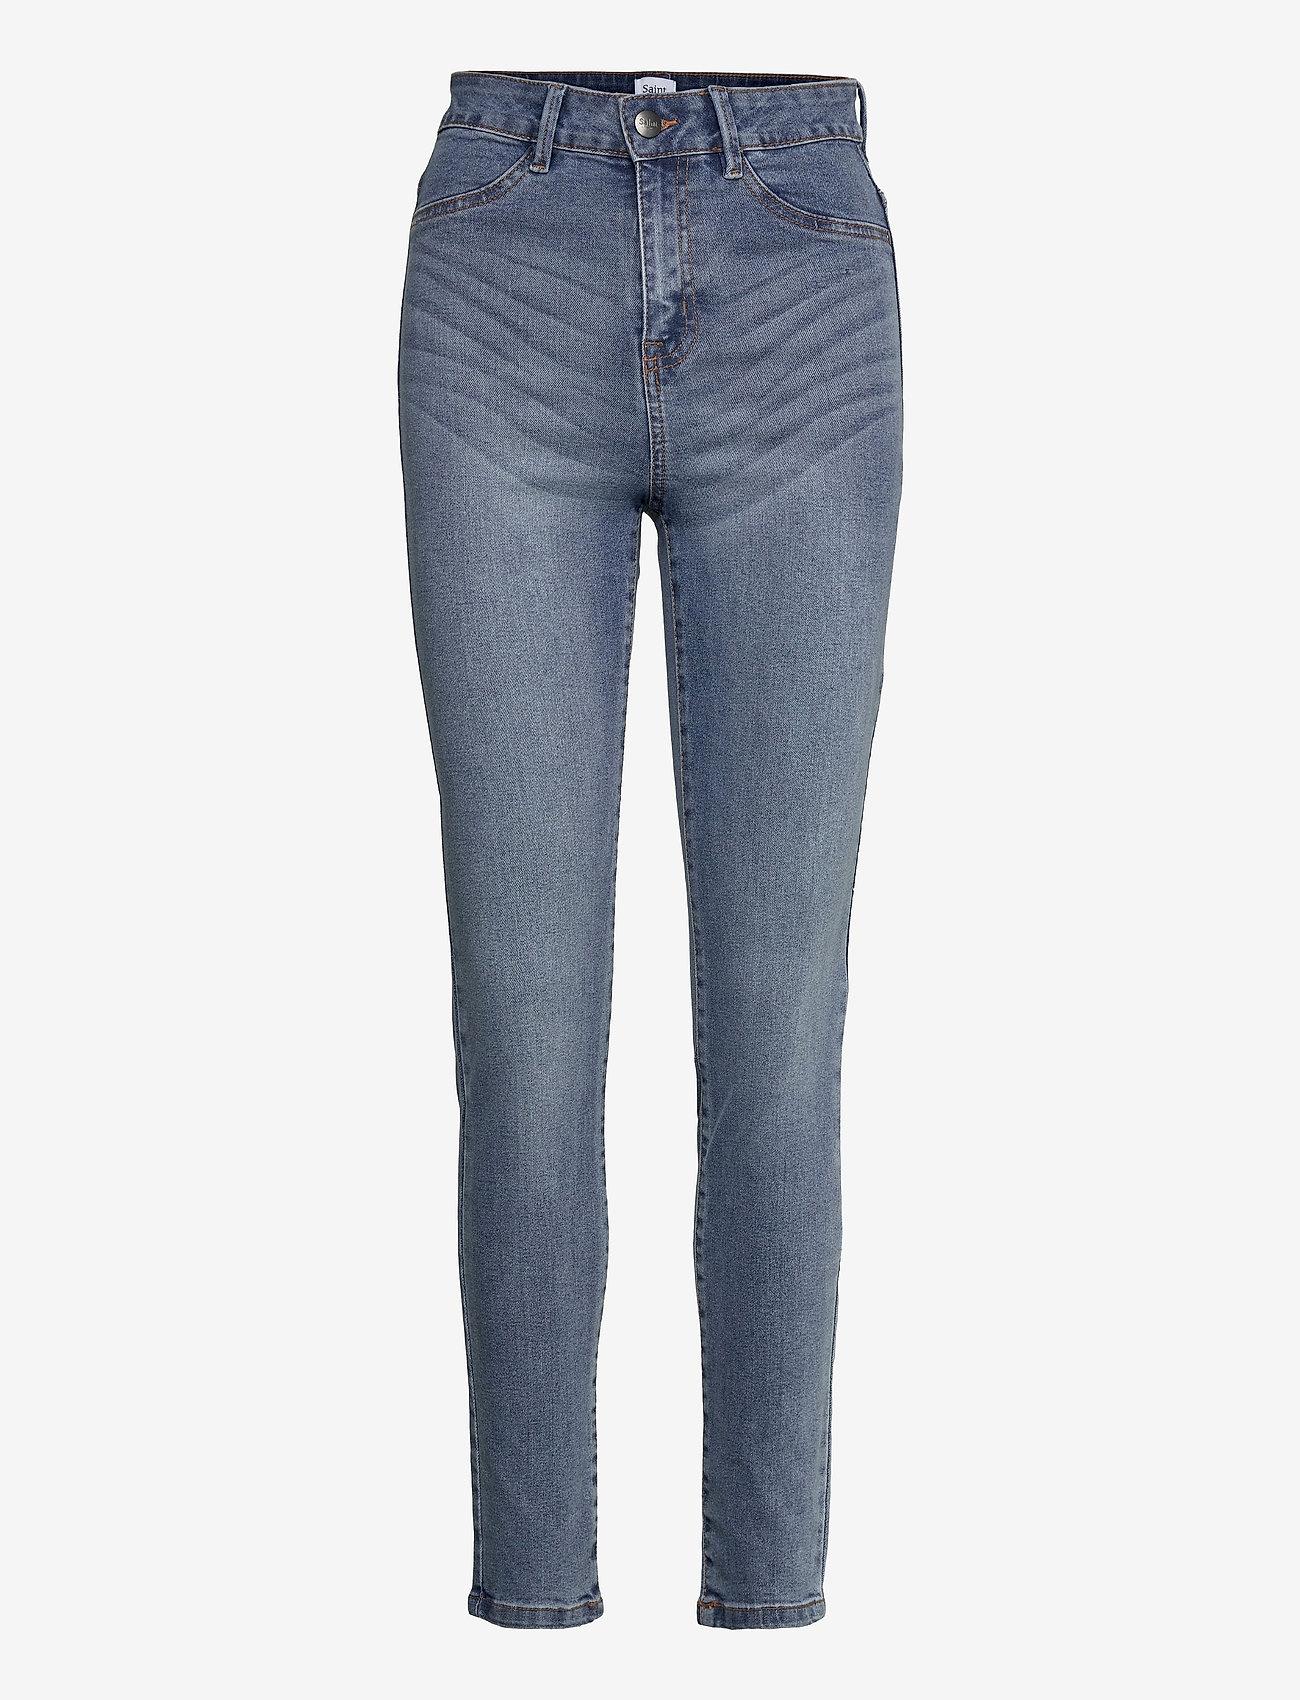 Saint Tropez - T5757, TinnaSZ Jeans - skinny jeans - light blue denim - 1